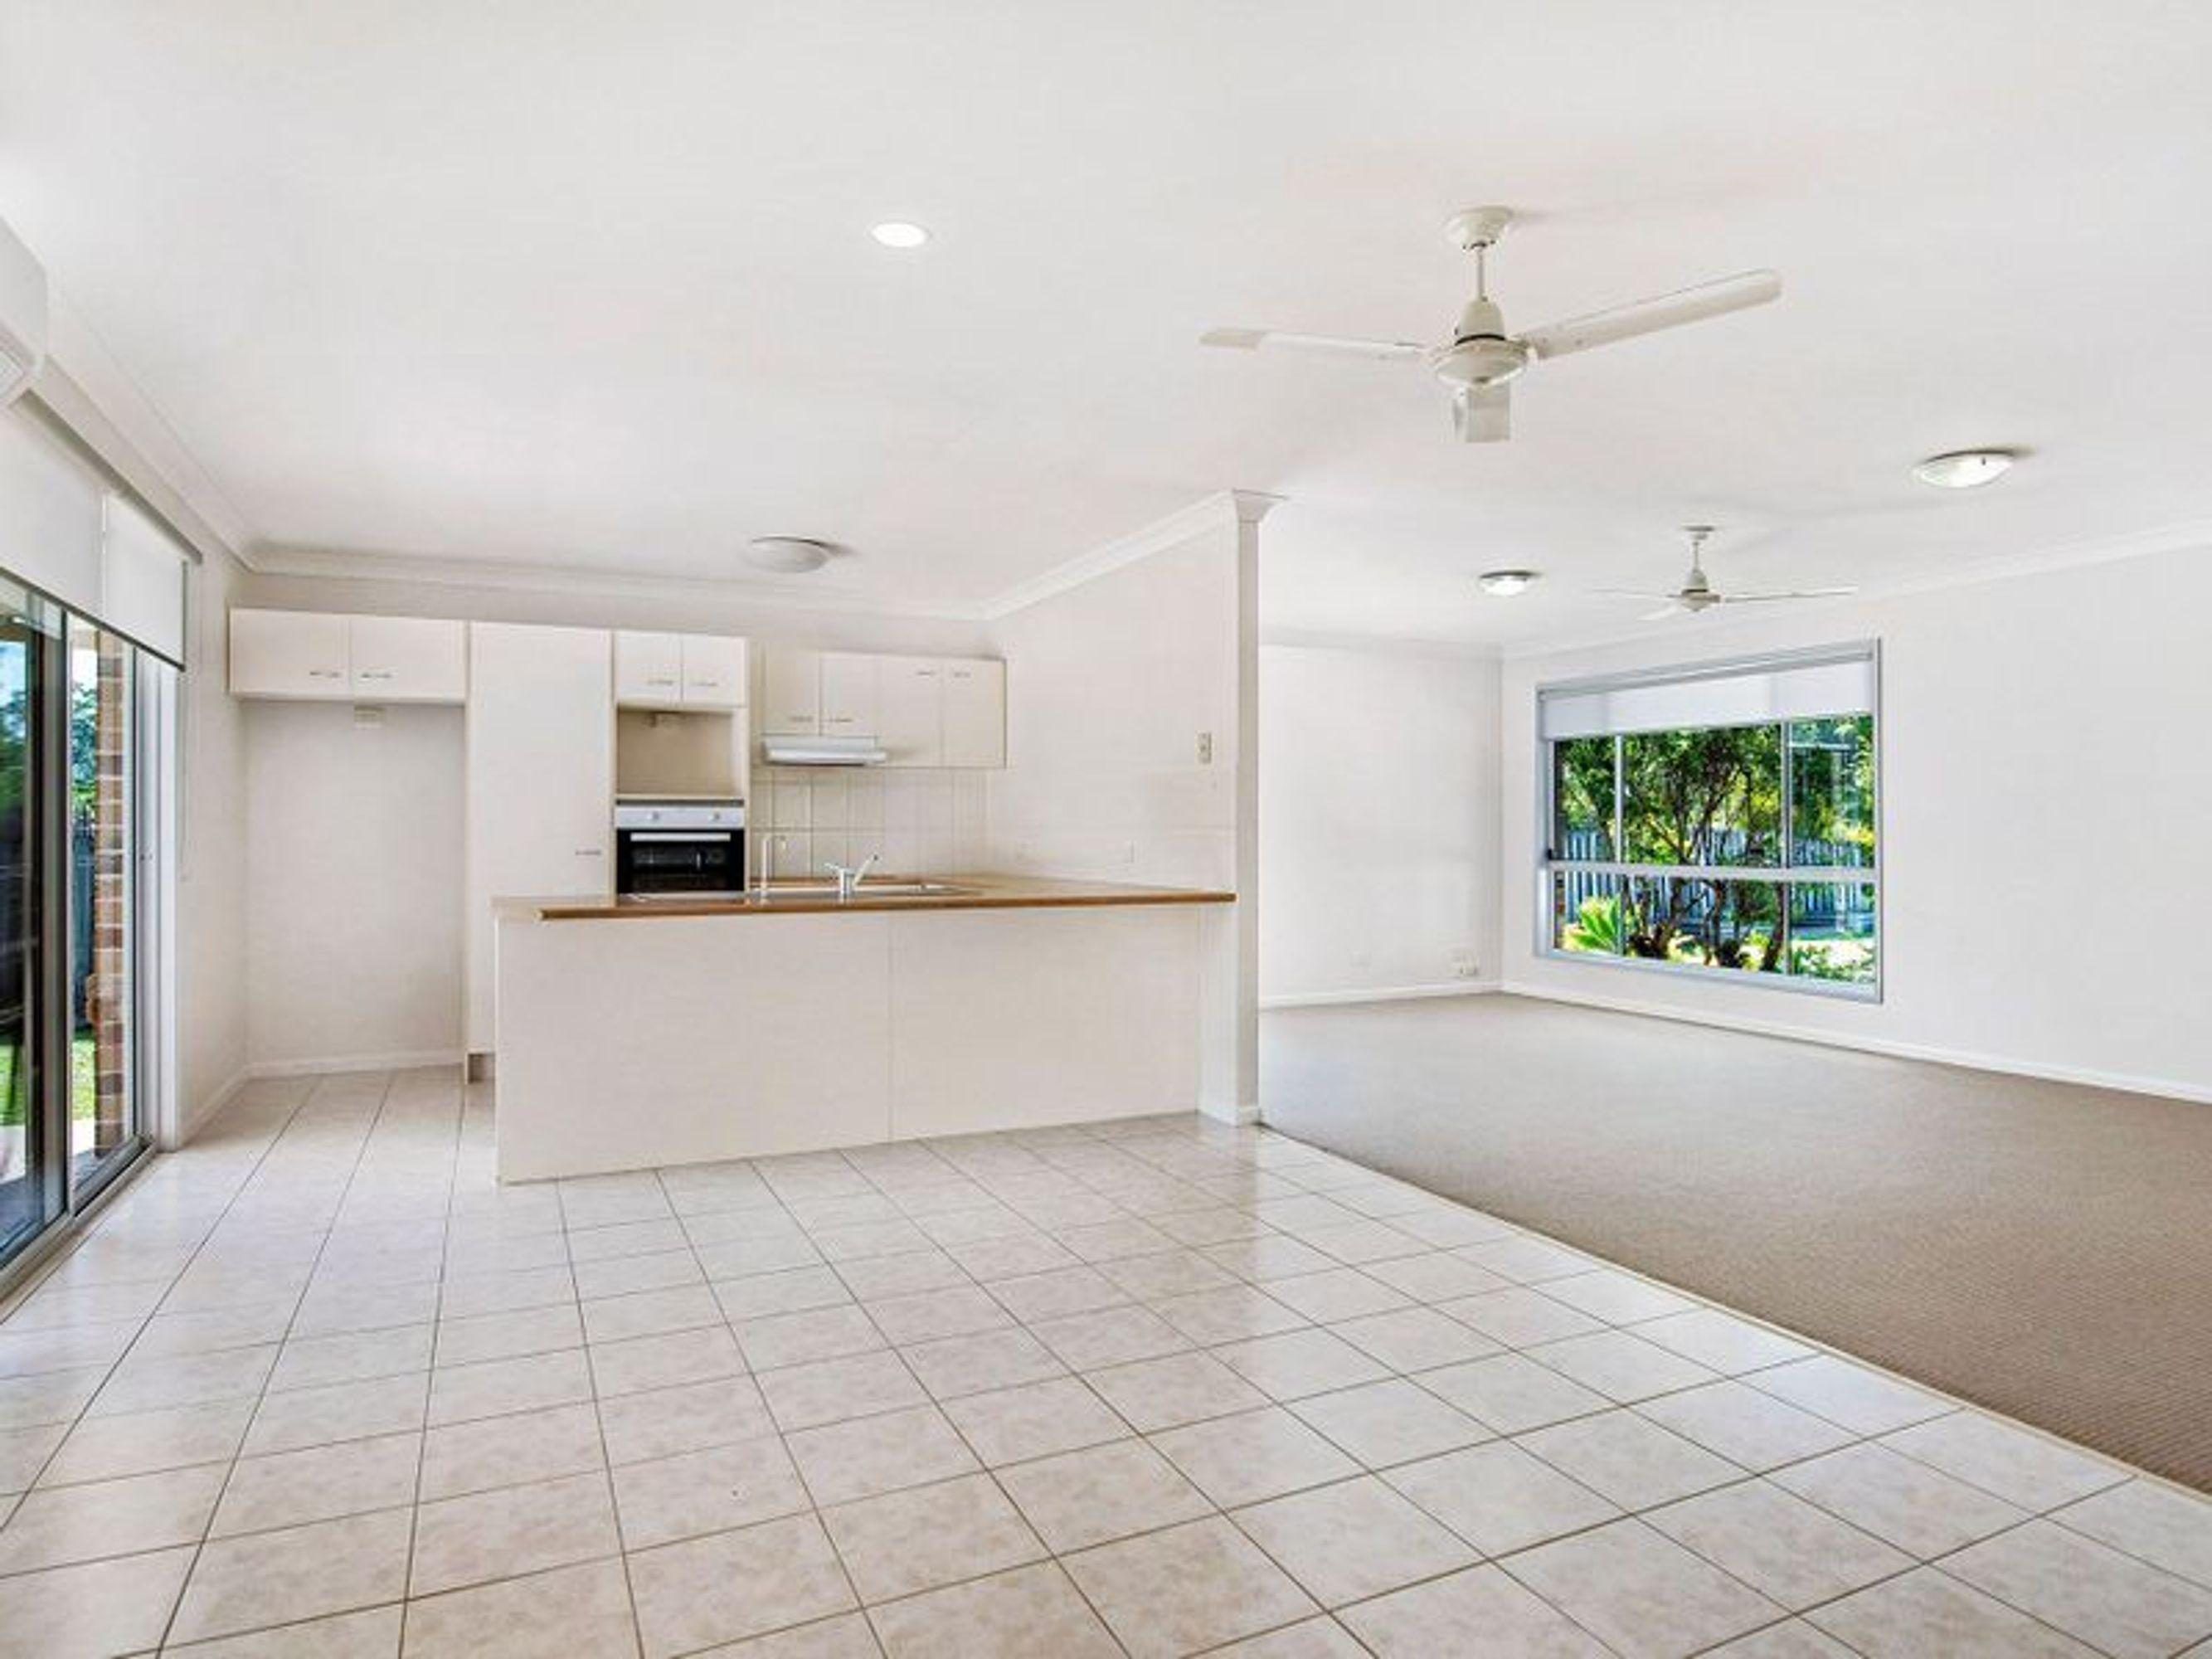 49 Leviathan Drive, Mudgeeraba, QLD 4213